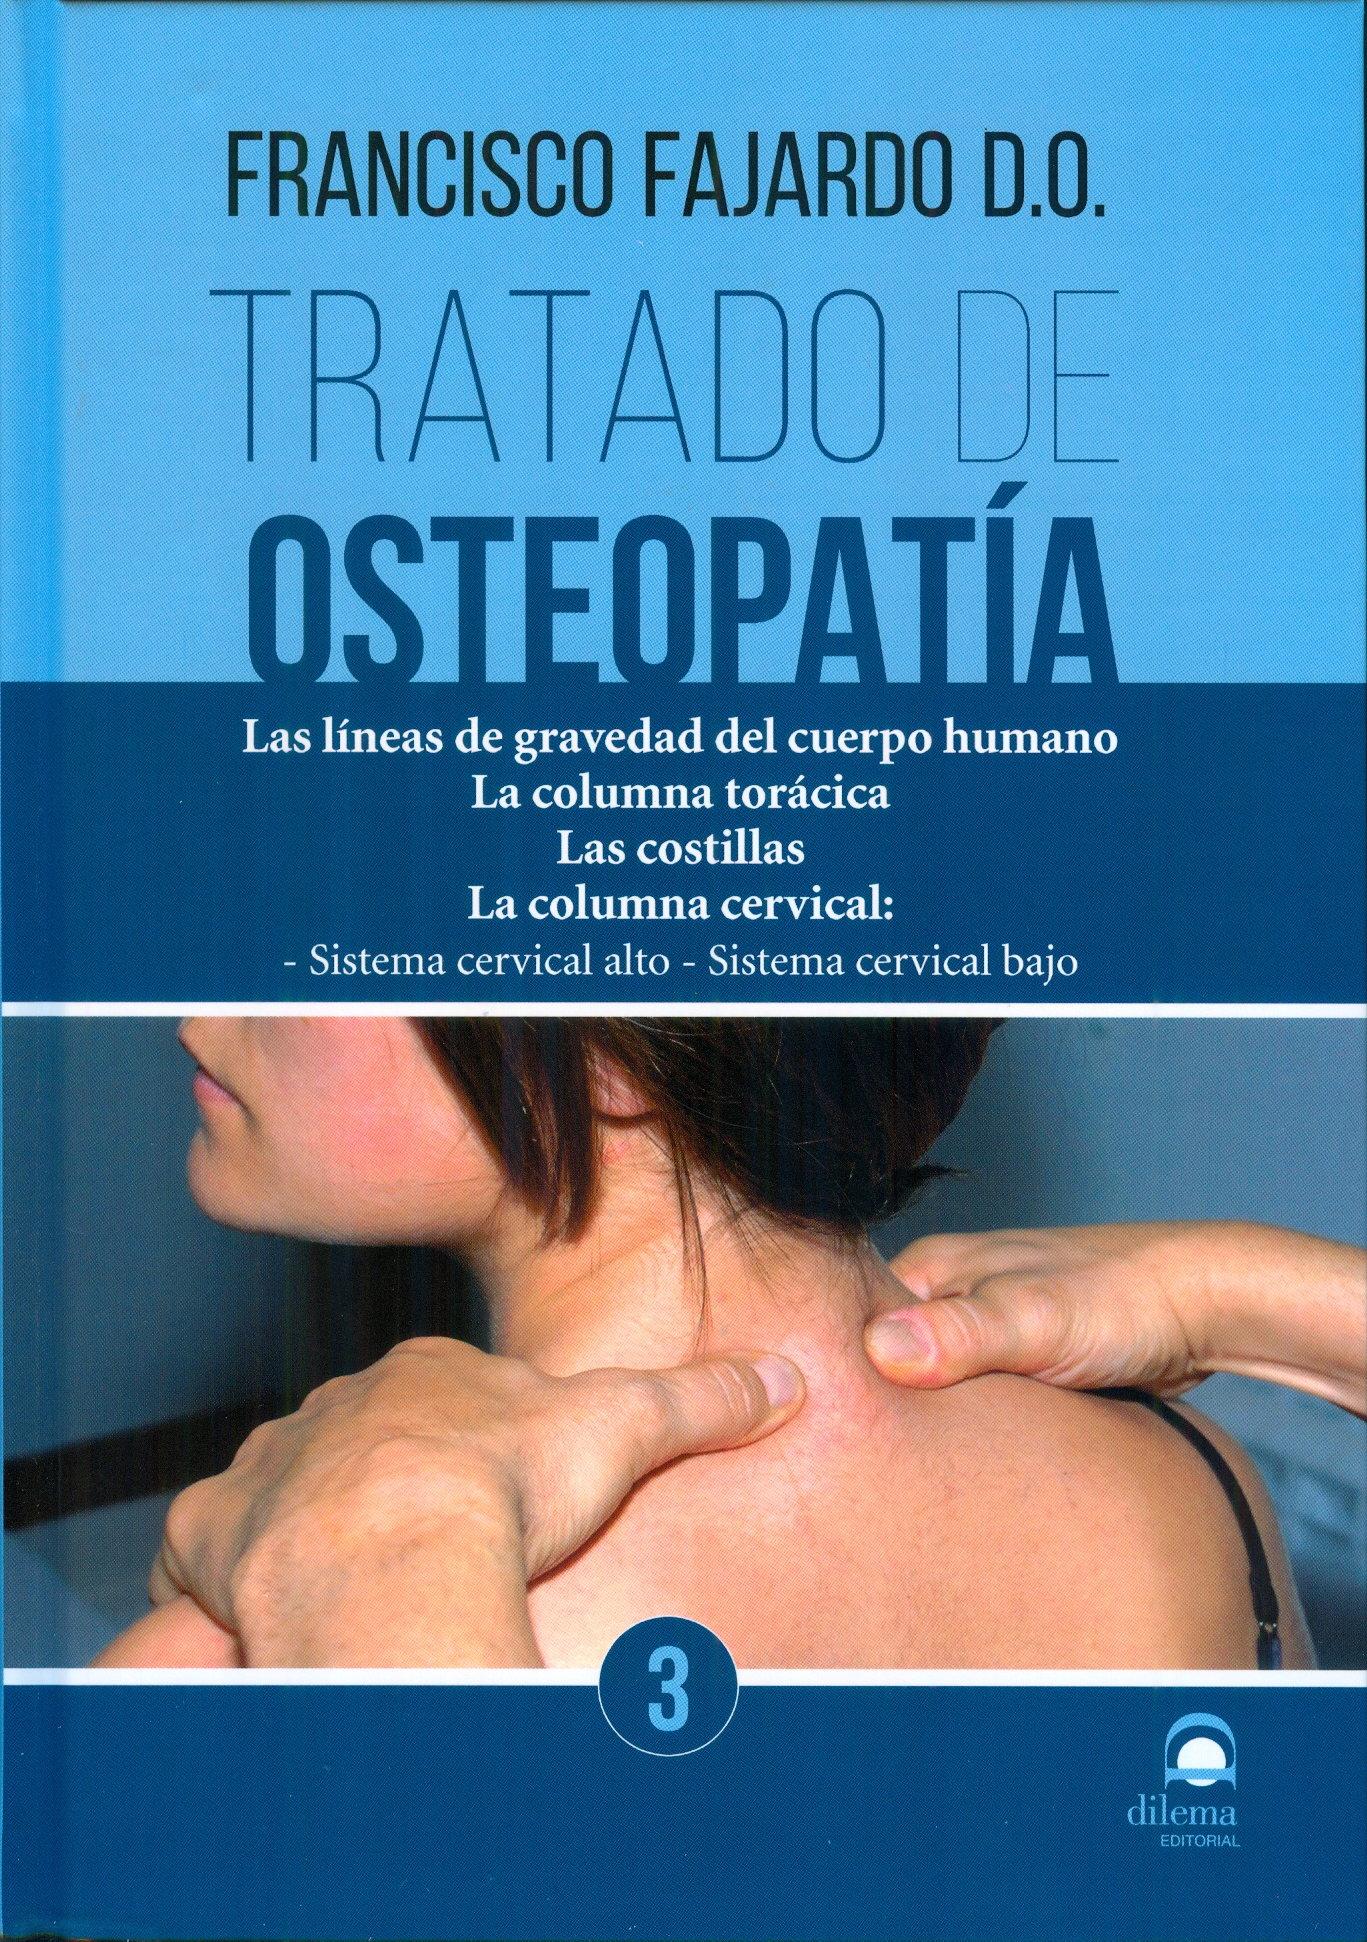 Tratado de osteopatía 3 Image